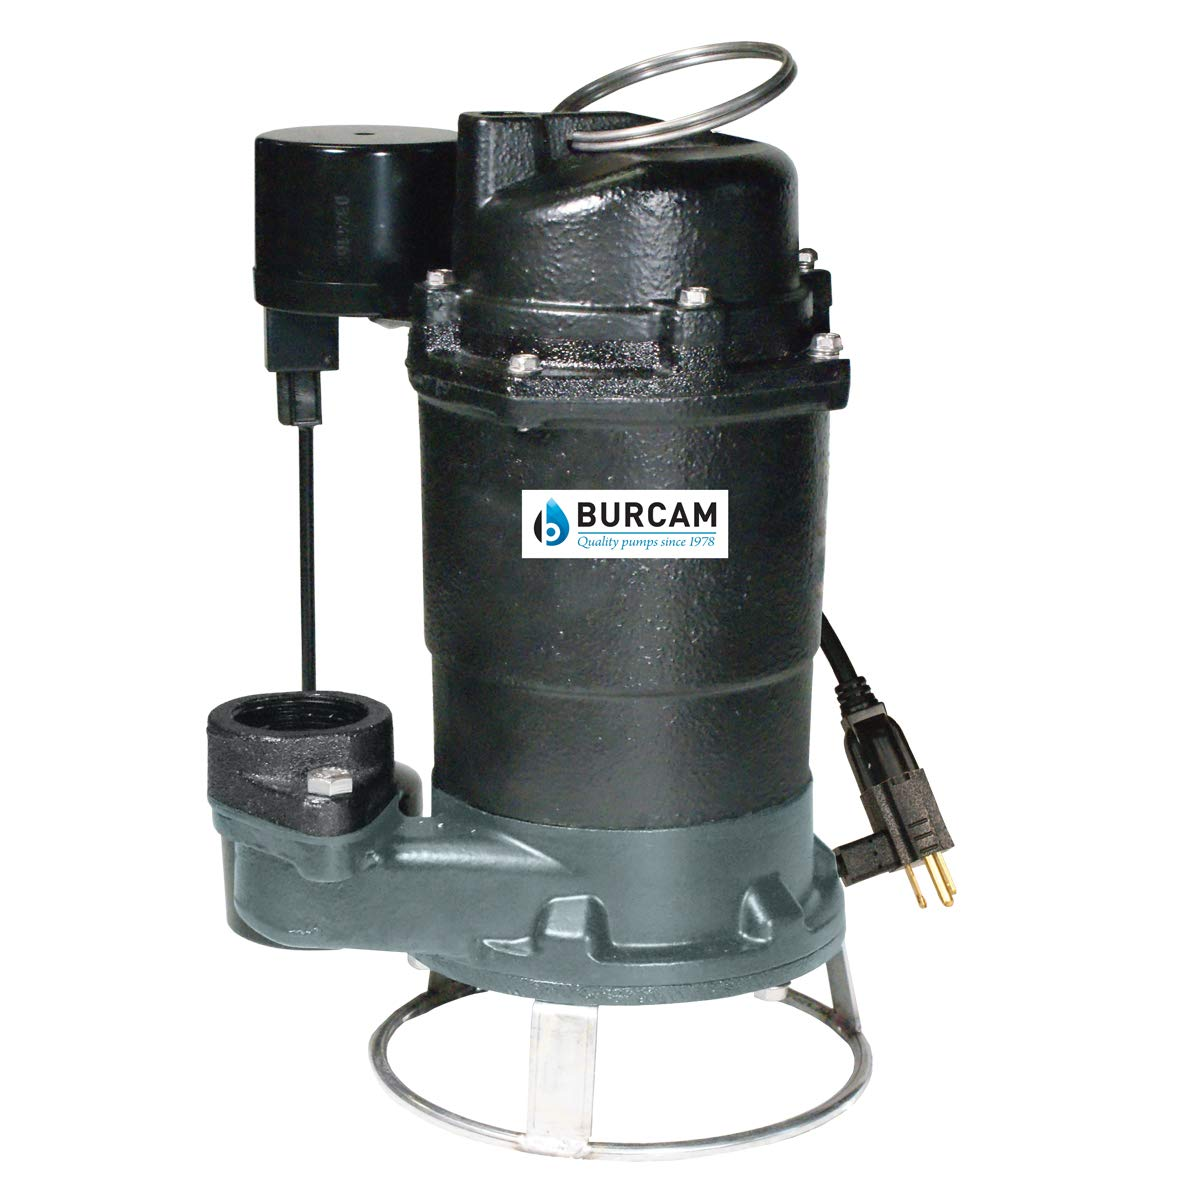 BURCAM 400700PZ 3/4HP Sewage Grinder Pump